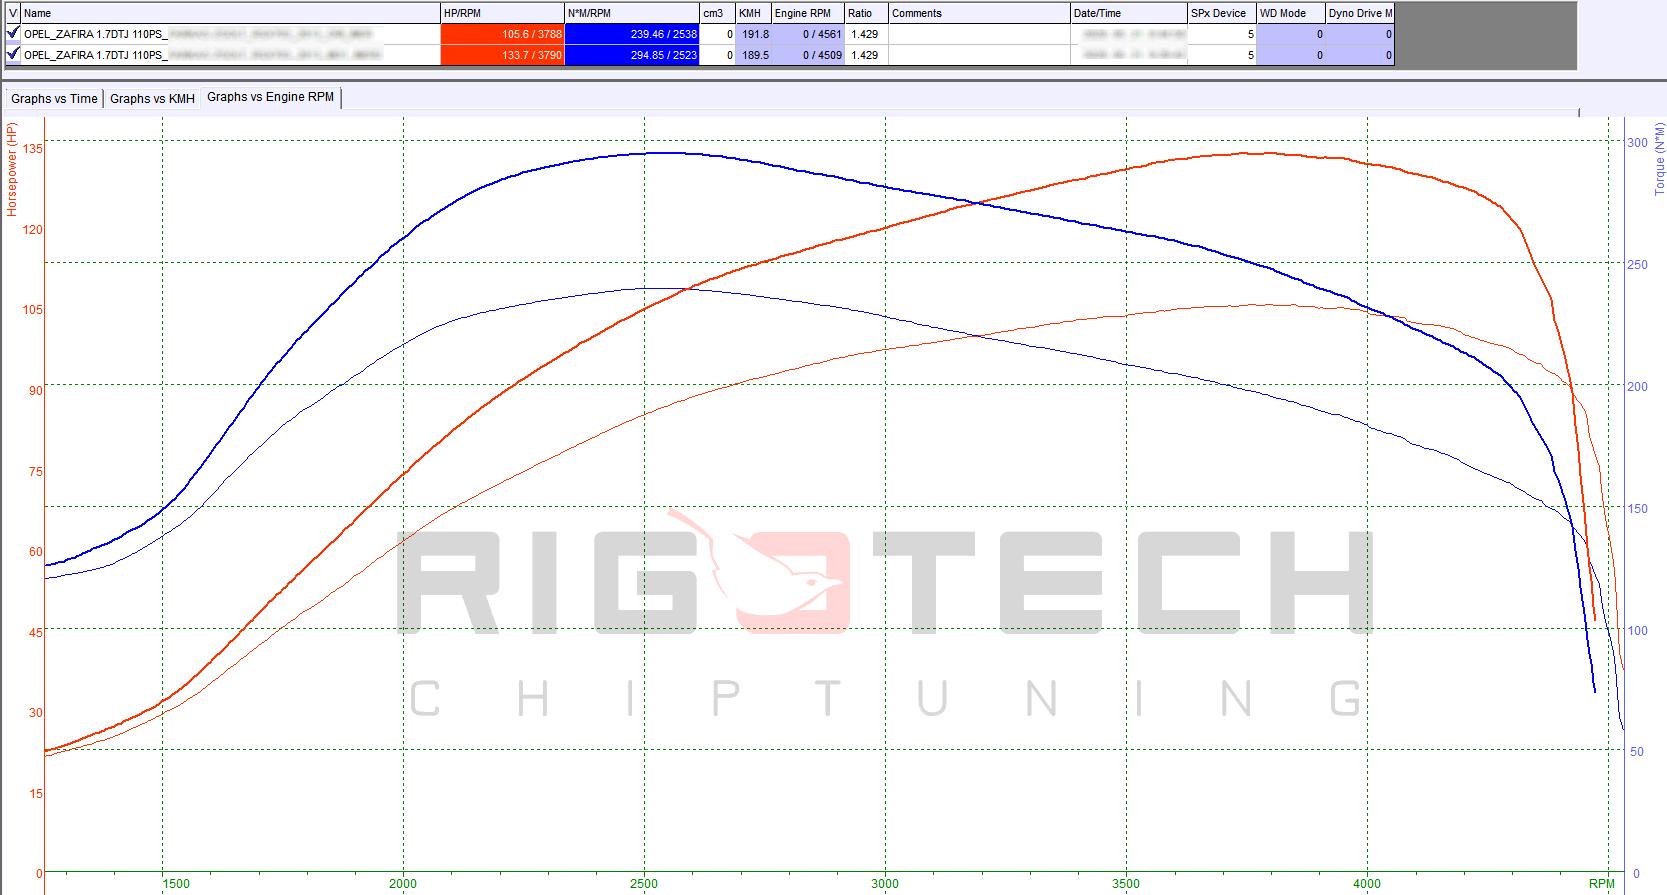 chevrolet-trax-1-7-vcdi-110-chiptuning-dyno